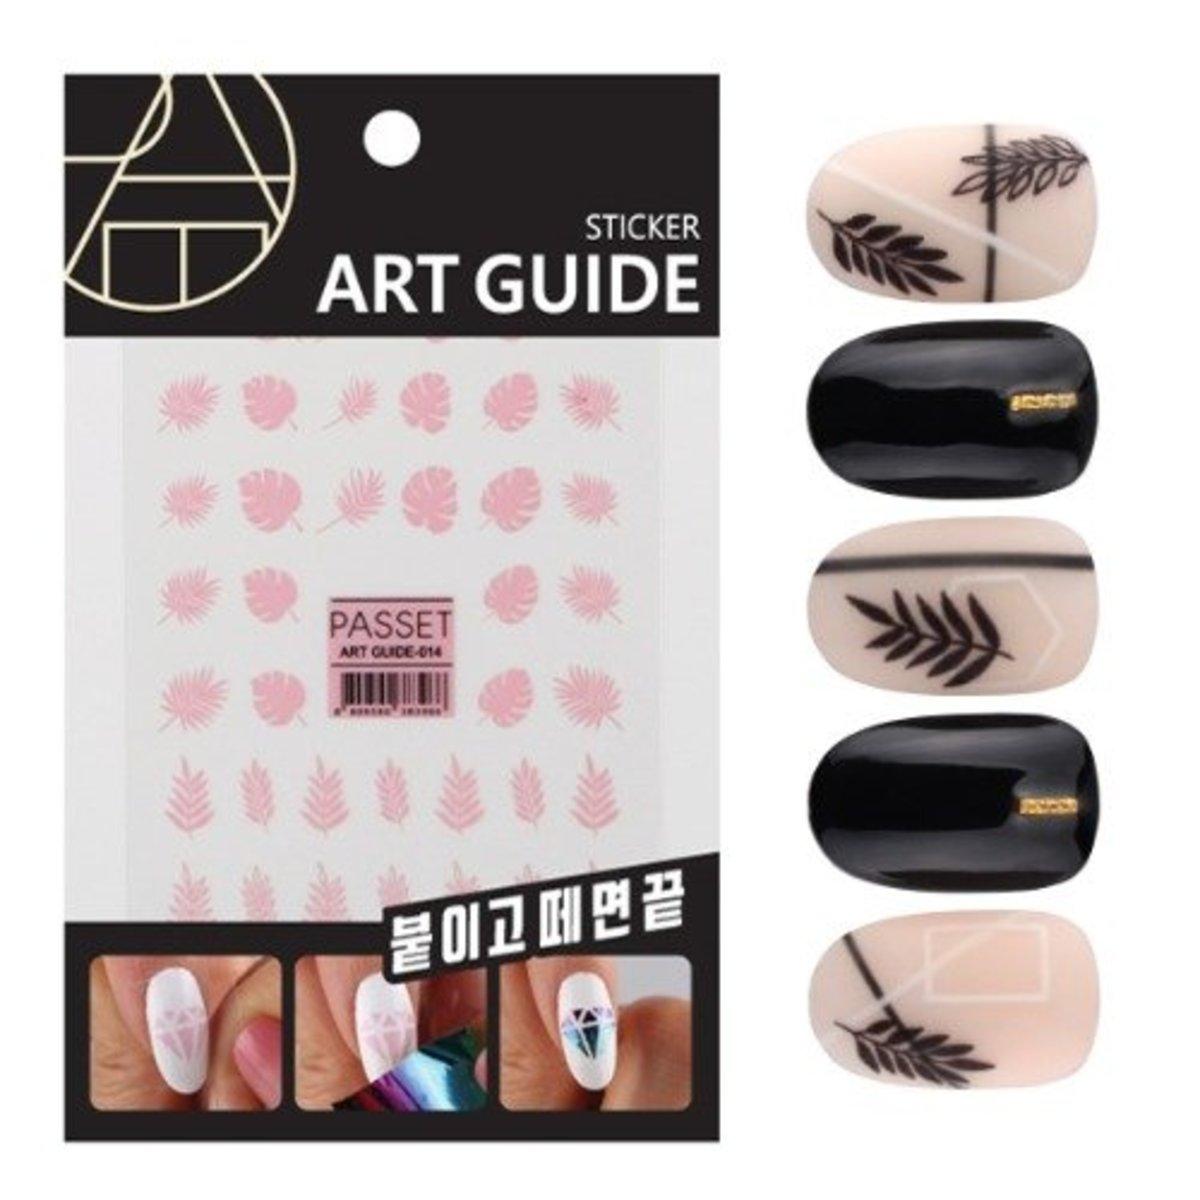 Art Guide Sticker No.14